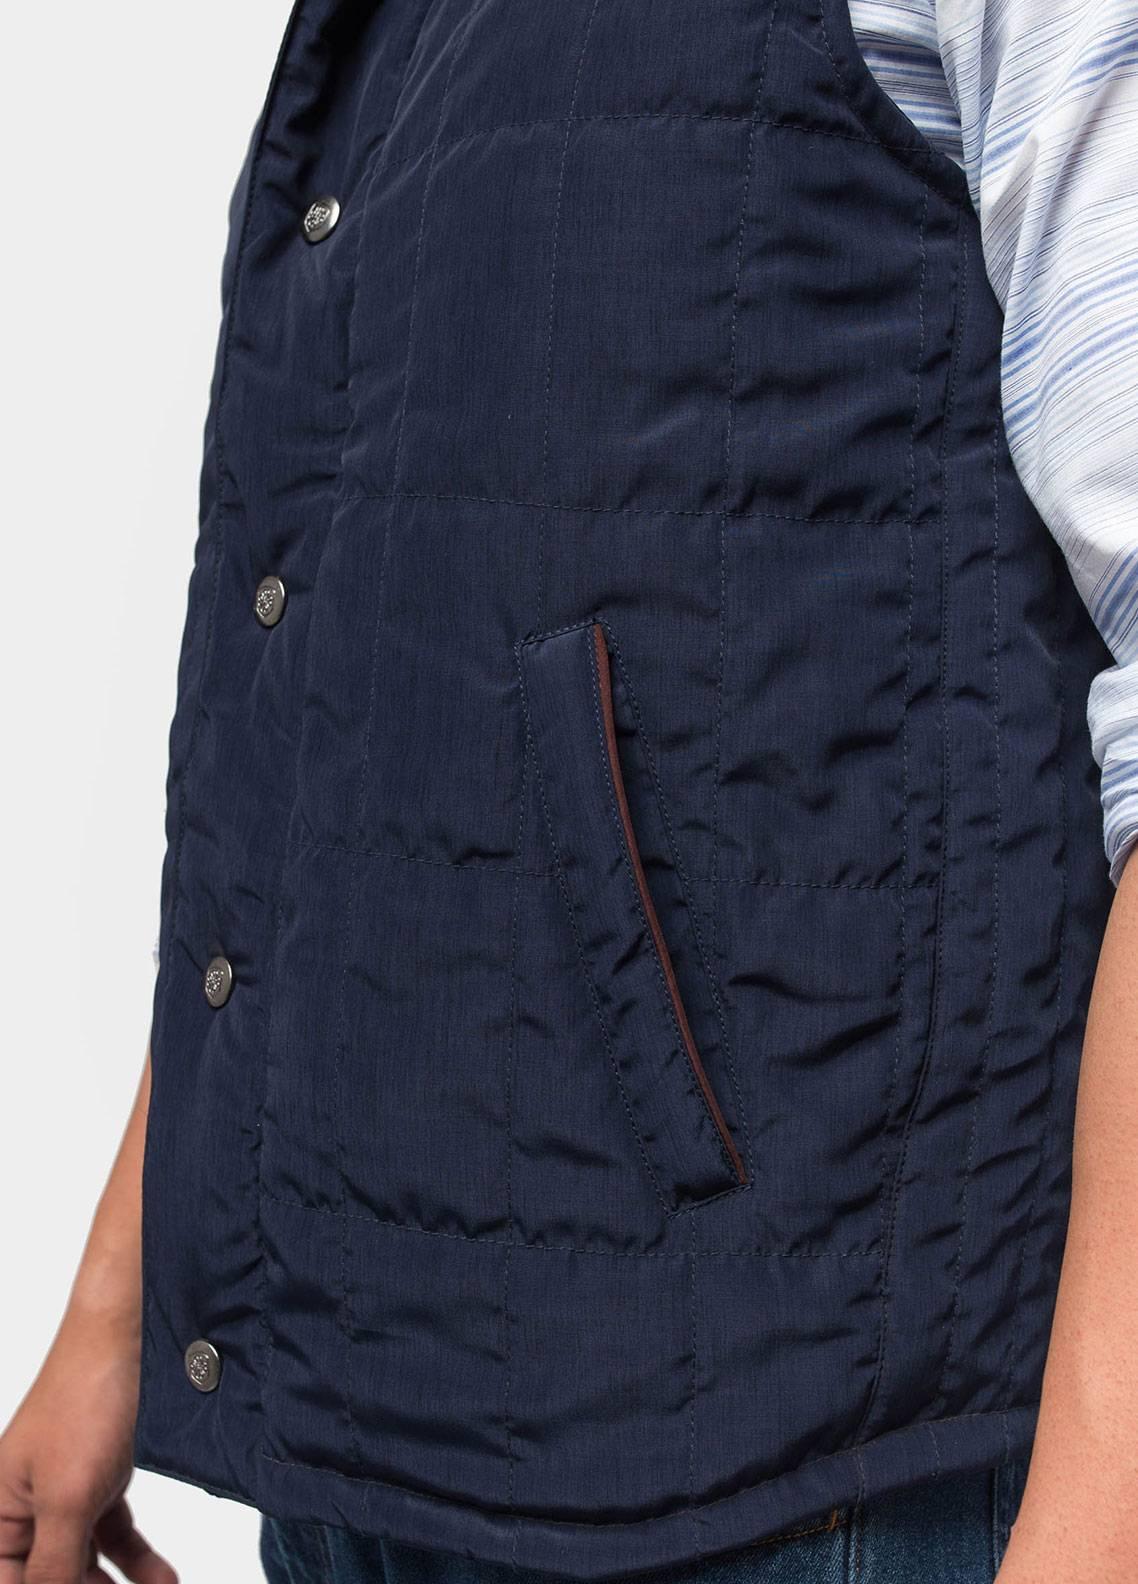 Brumano Polyester Sleeveless Men Jackets - Navy Blue BRM-12-1003